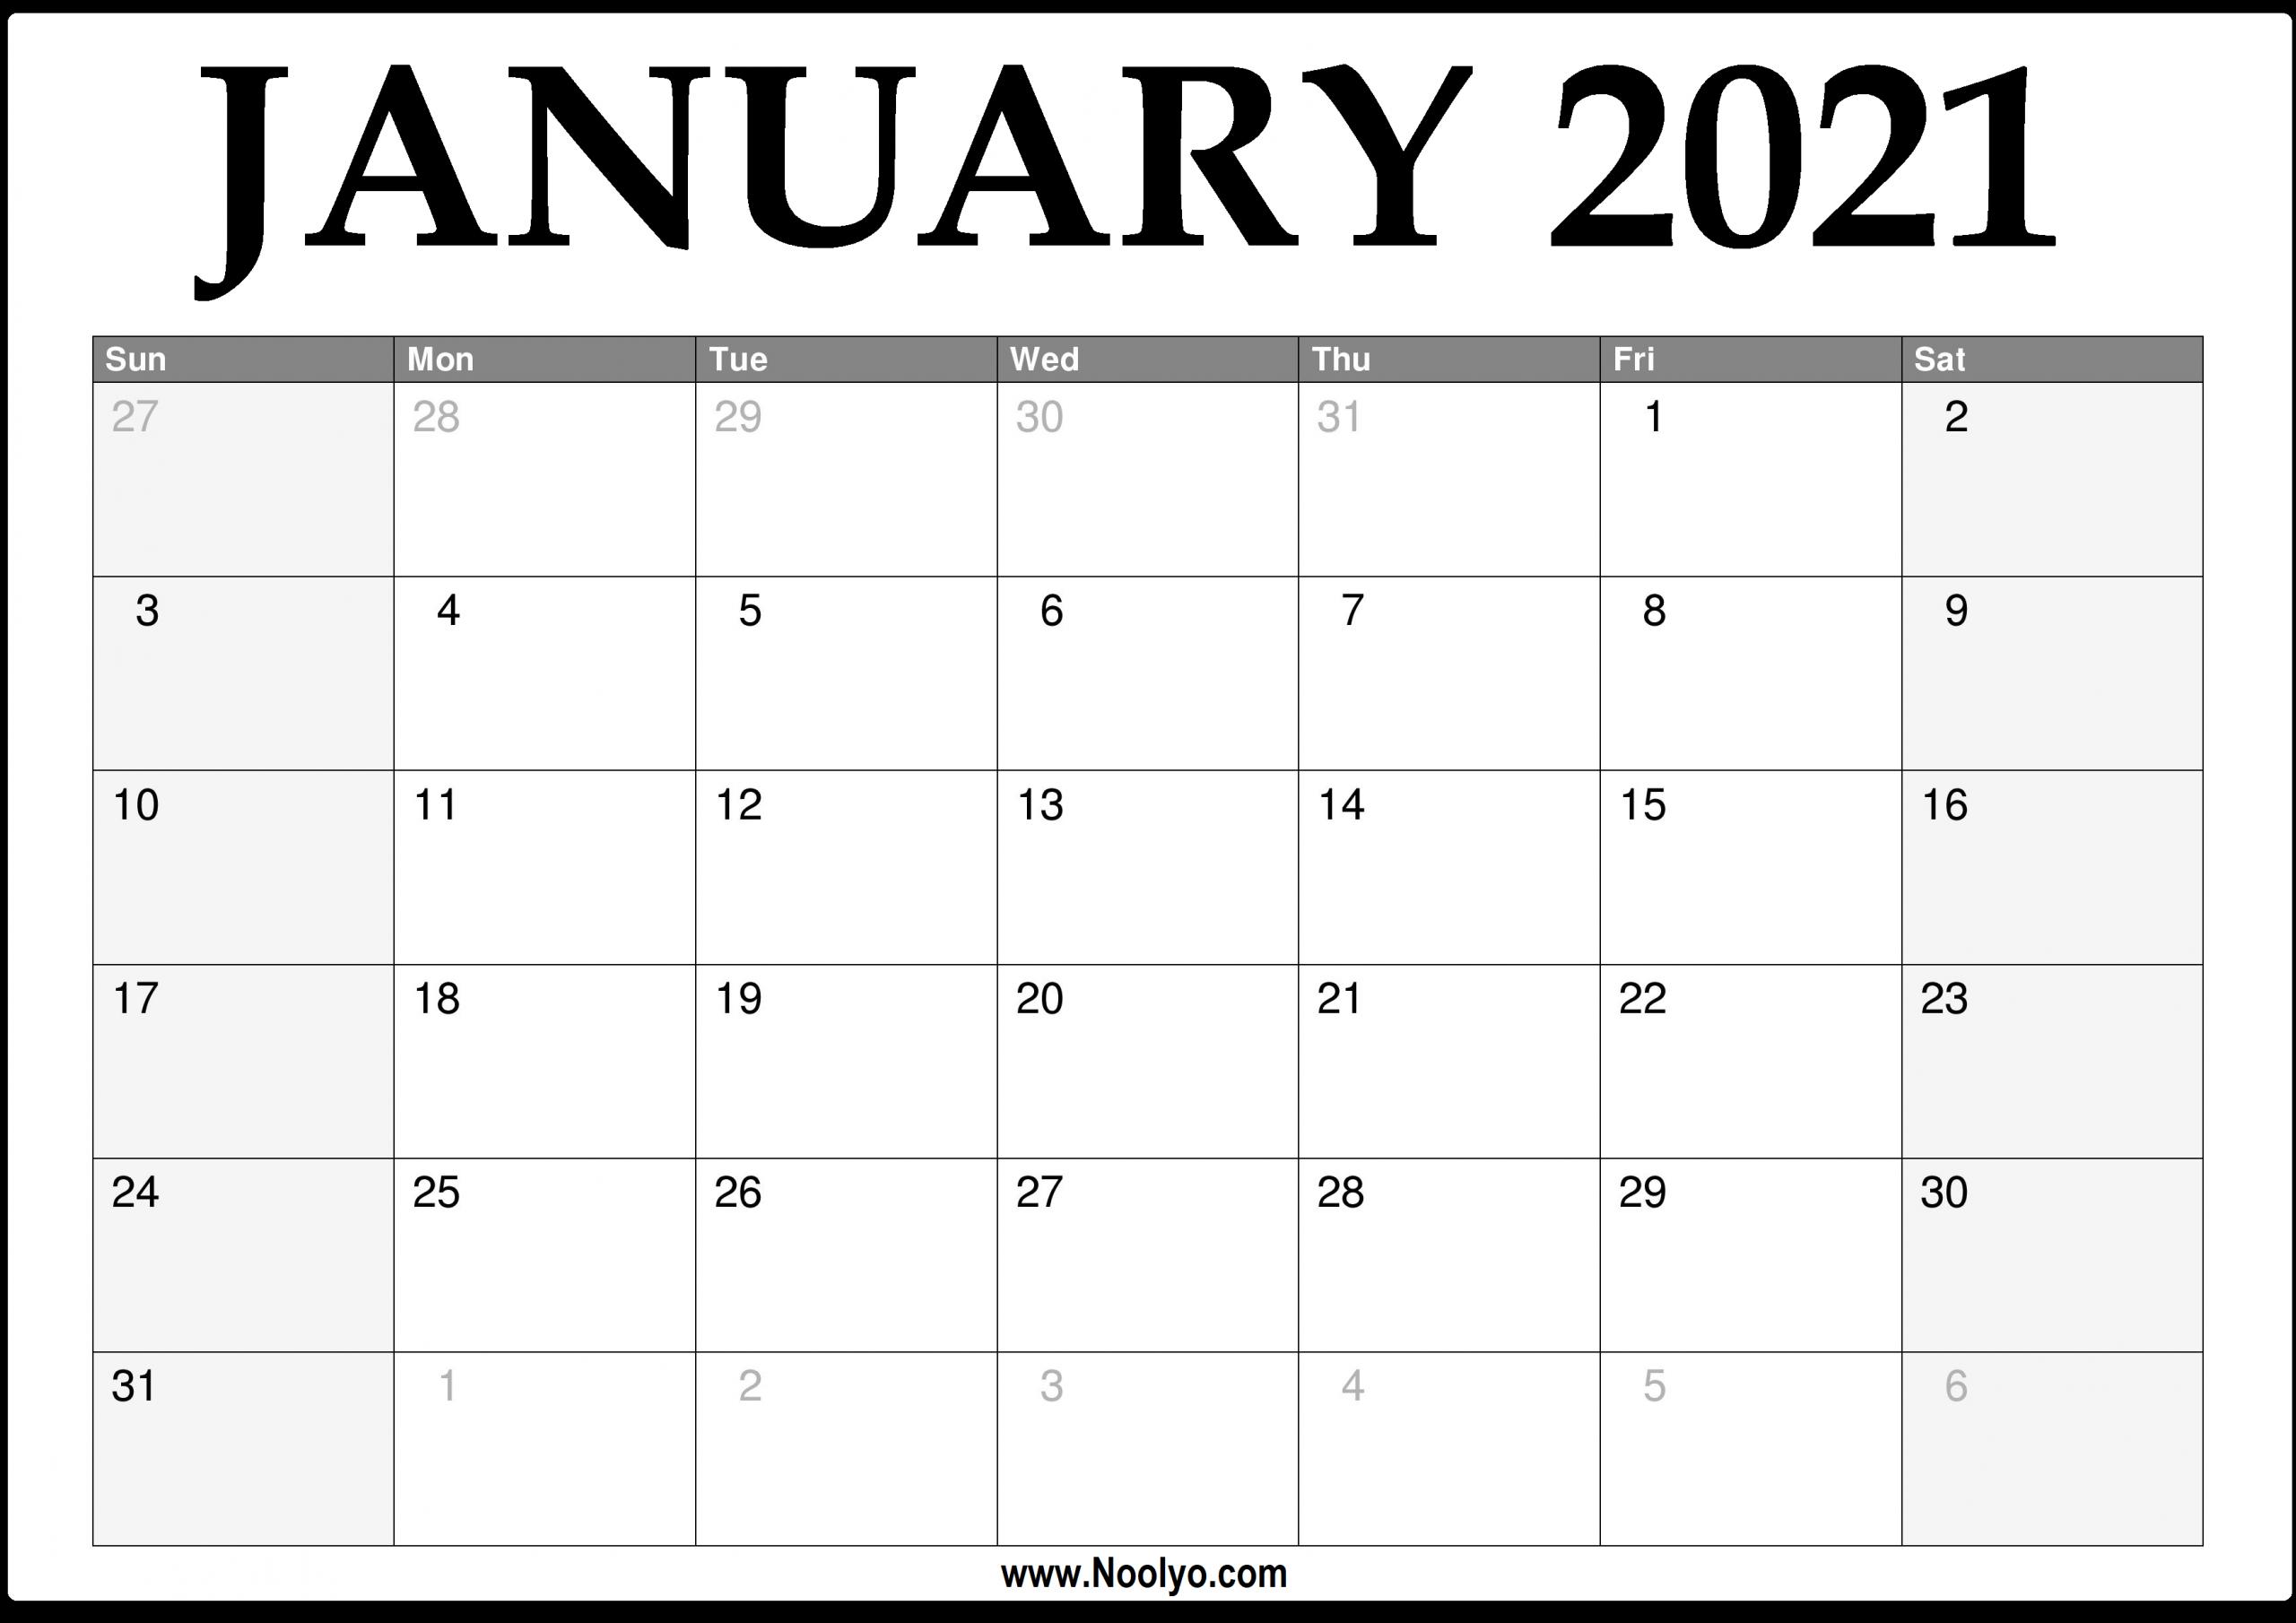 2021 January Calendar Printable Download Free Noolyo